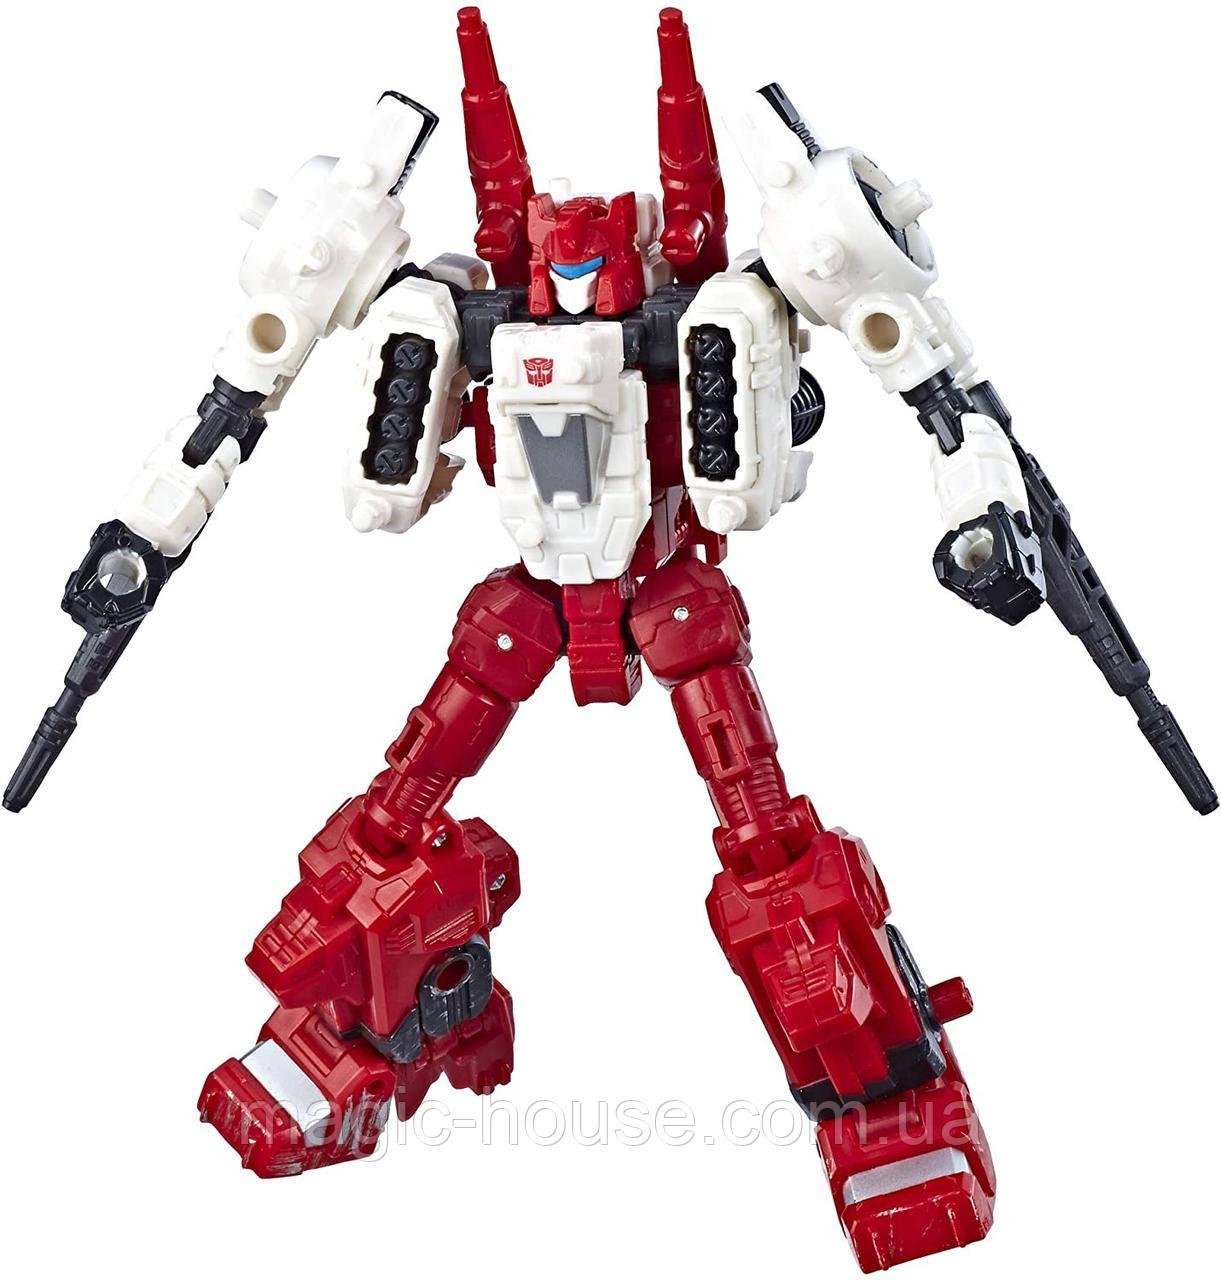 Трансформер Сиксган Autobot SixGun Оригінал Transformers